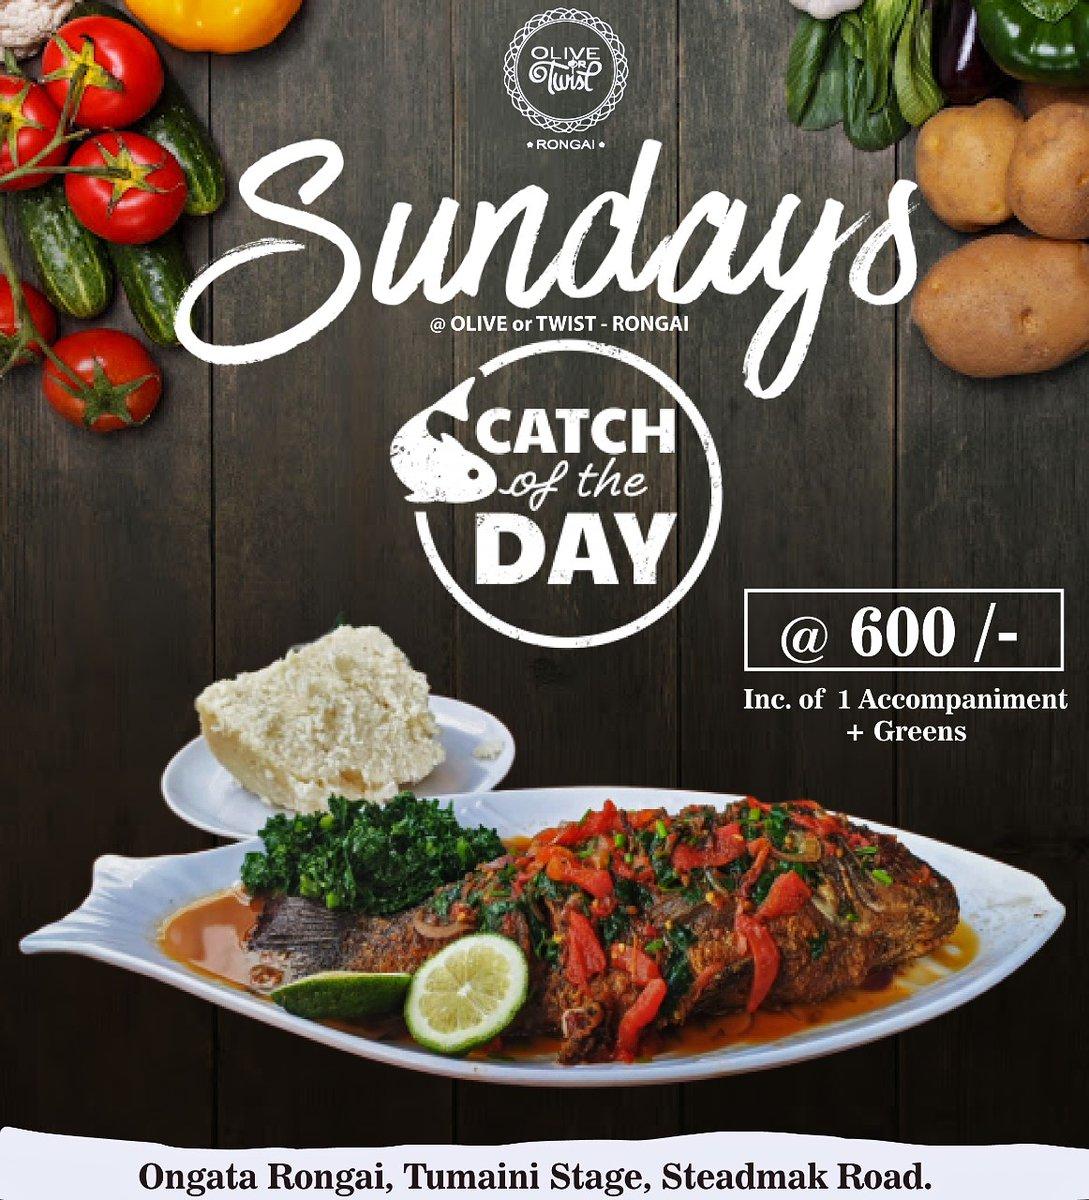 Sundays Special CATCH OF THE DAY Flavorsome Whole FISH, Inclusive of 1 Accompaniment +  Greens @ 600 /- . Karibu OLIVE or TWIST LOUNGE - RONGAI  #fish #CatchOfTheDay Vanessa Kobi Waiguru Betty Naivasha #lakeside pic.twitter.com/4mfmSrBGDg